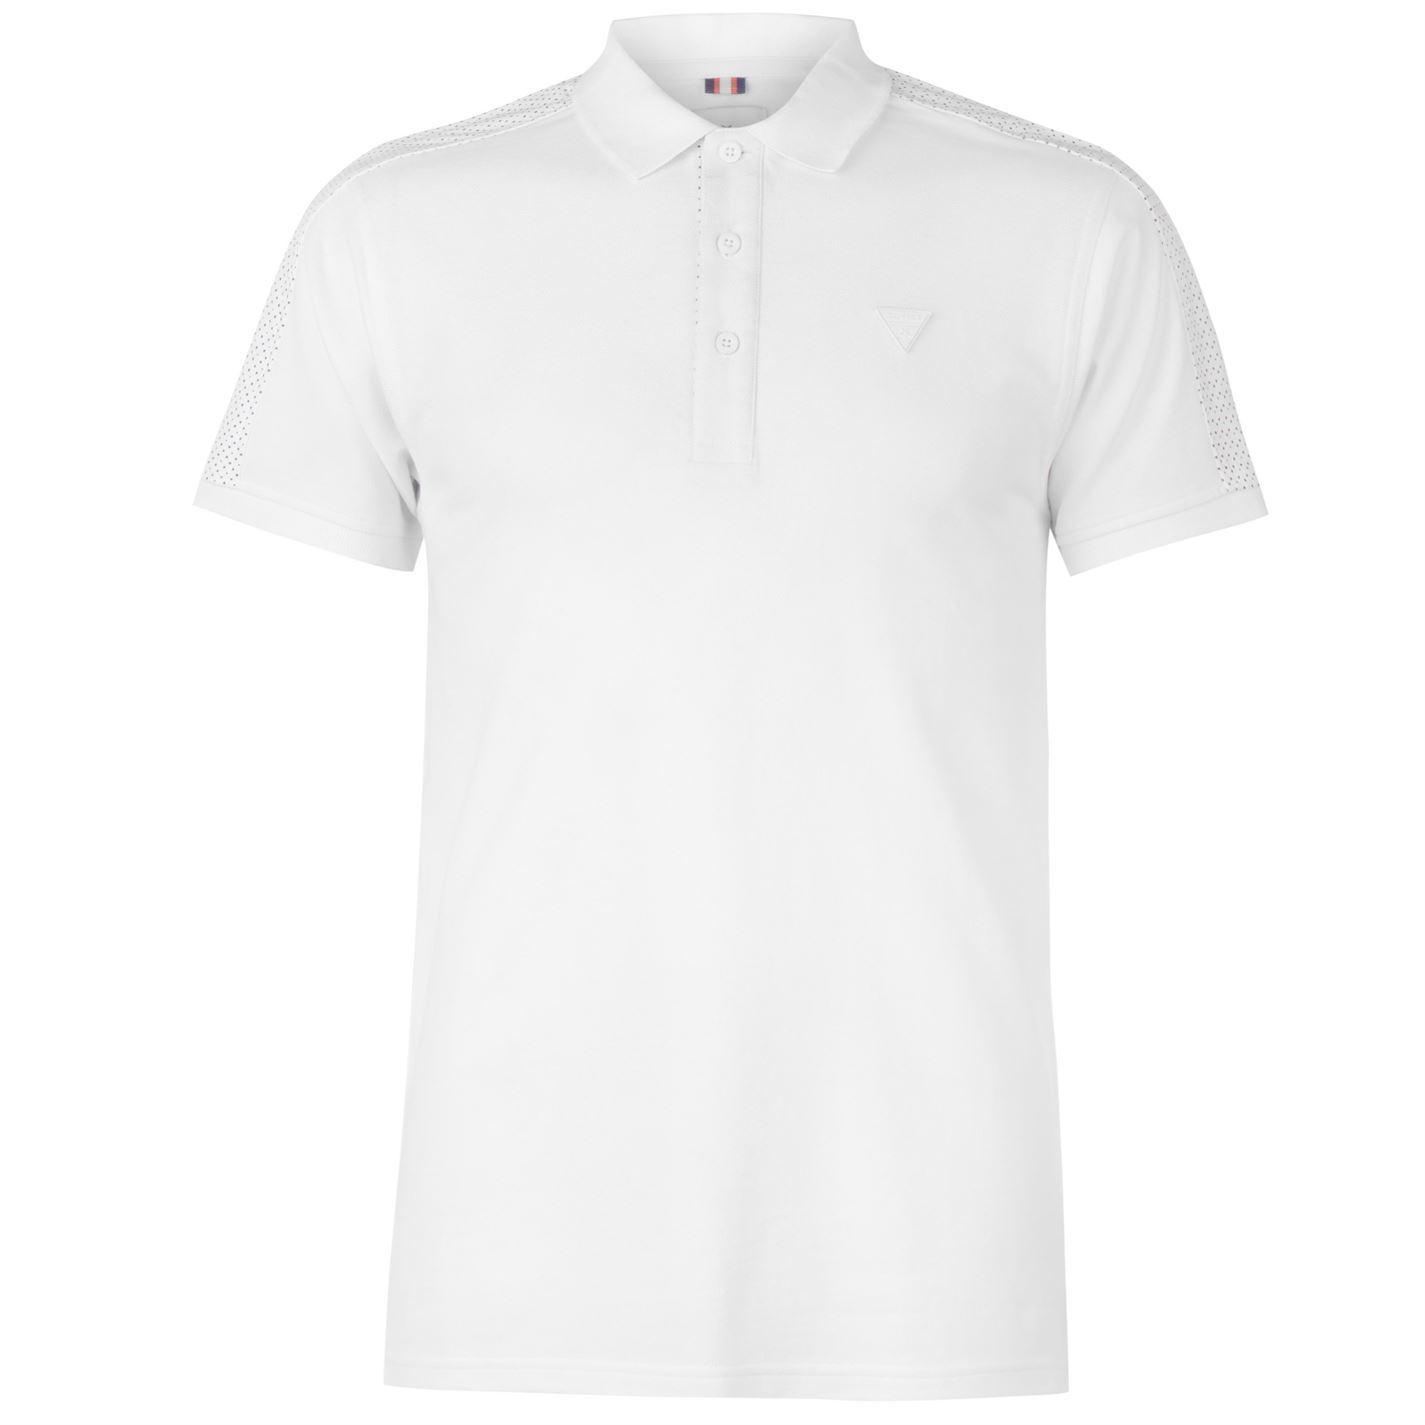 Soviet Paisley Collar Polo Shirt Mens Collared Top Tee Navy X-Small